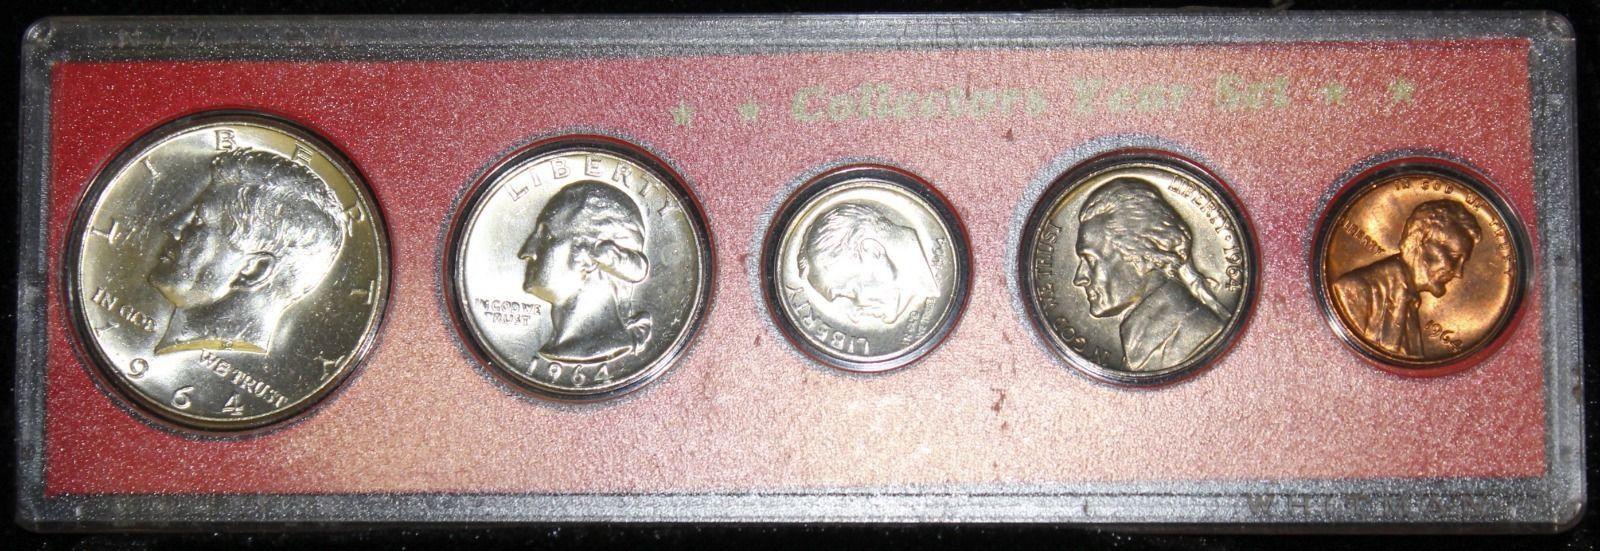 1964 Choice Brilliant Uncirculated Philadelphia Mint Silver Year Set